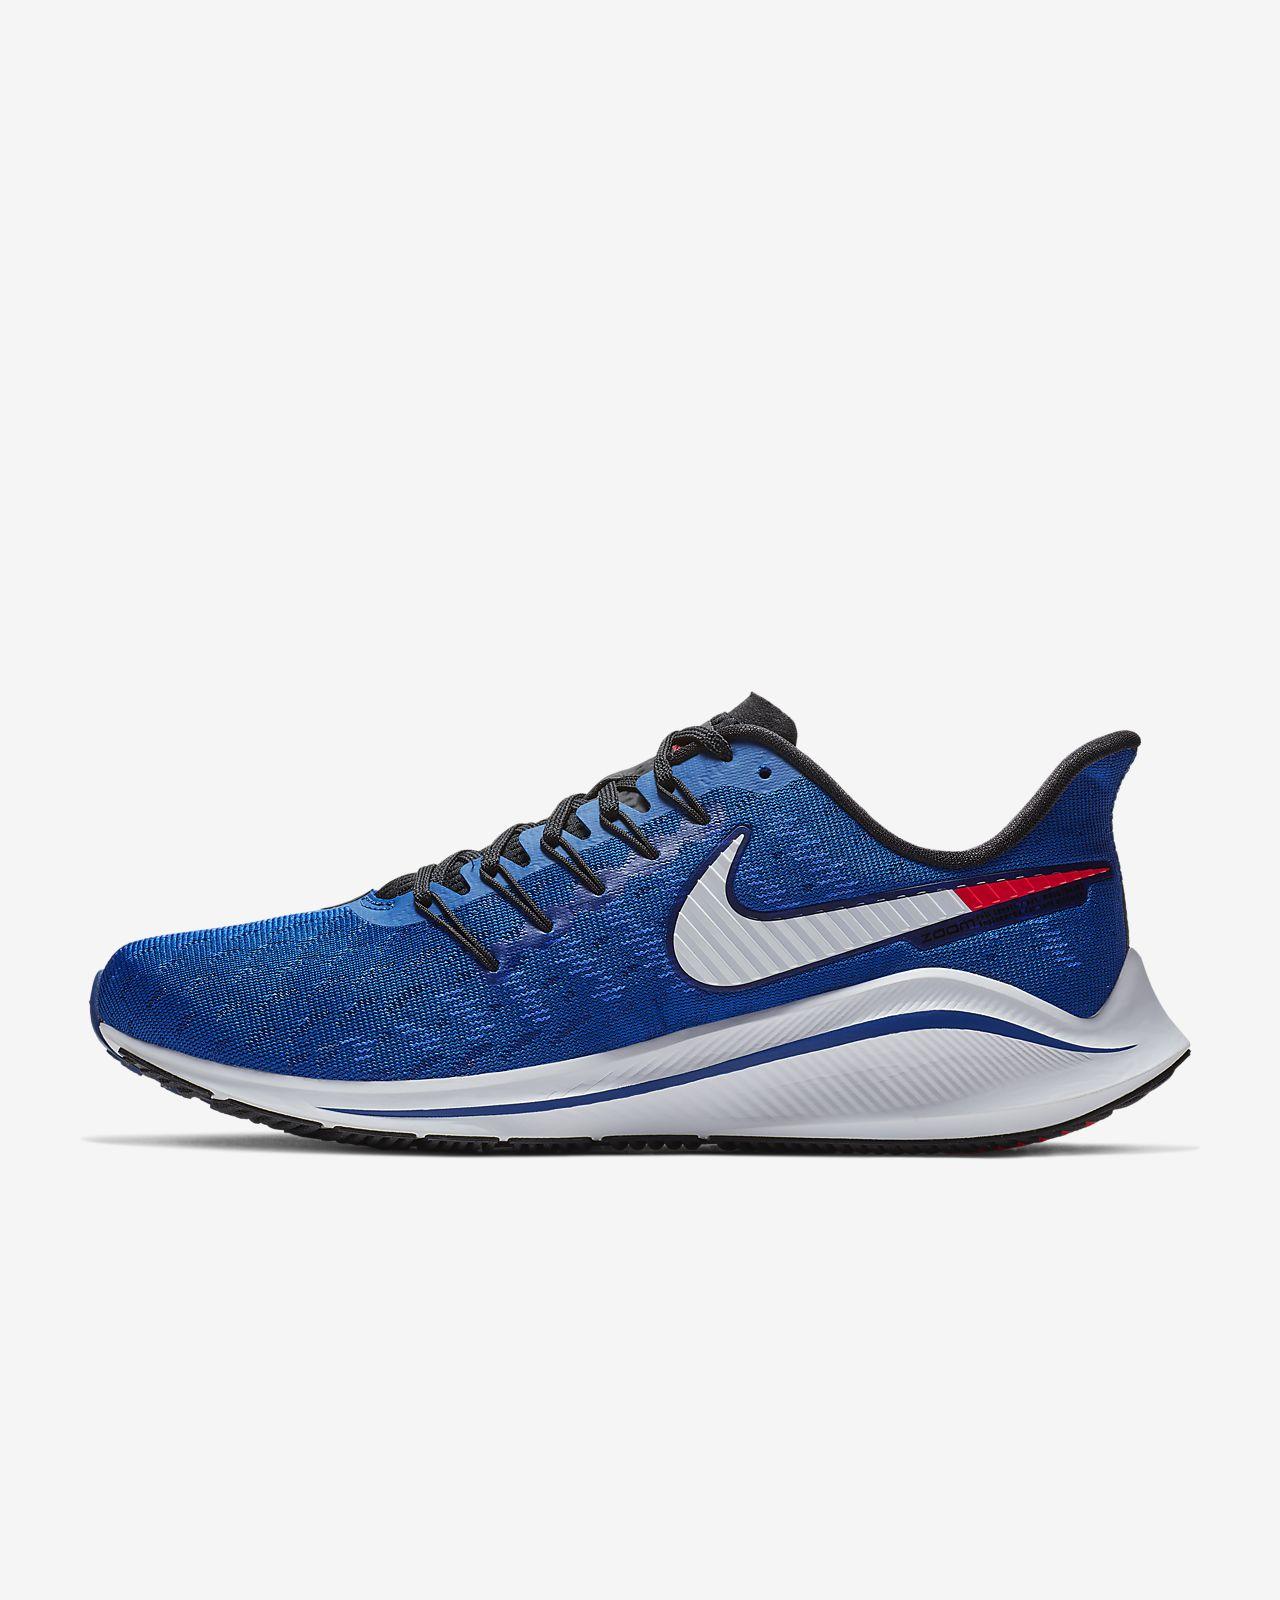 info for 1731a 17cd8 ... Calzado de running para hombre Nike Air Zoom Vomero 14